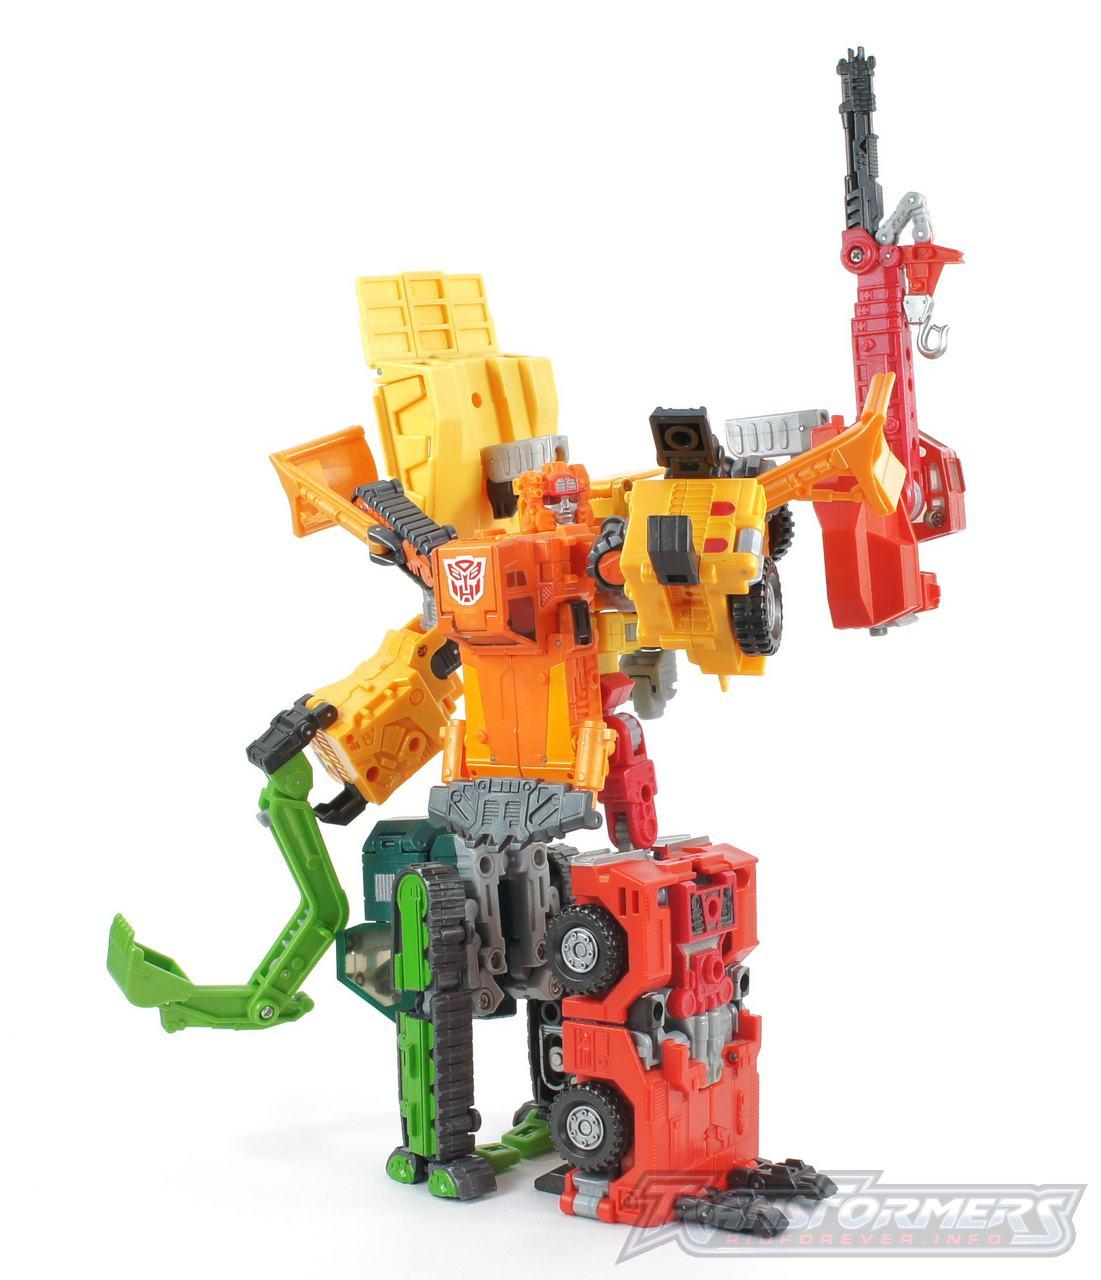 Build King 006